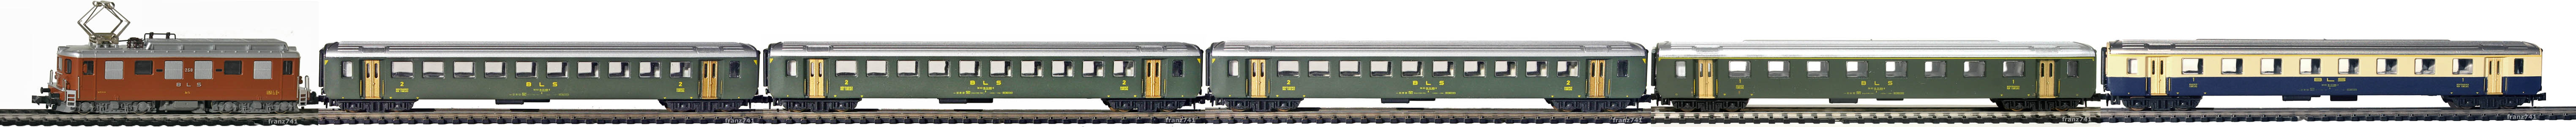 Epoche-III-BLS-EW-I-Personenzug_Ae-4-4-Elok-EW-I-Wagen-alte-Beschriftung